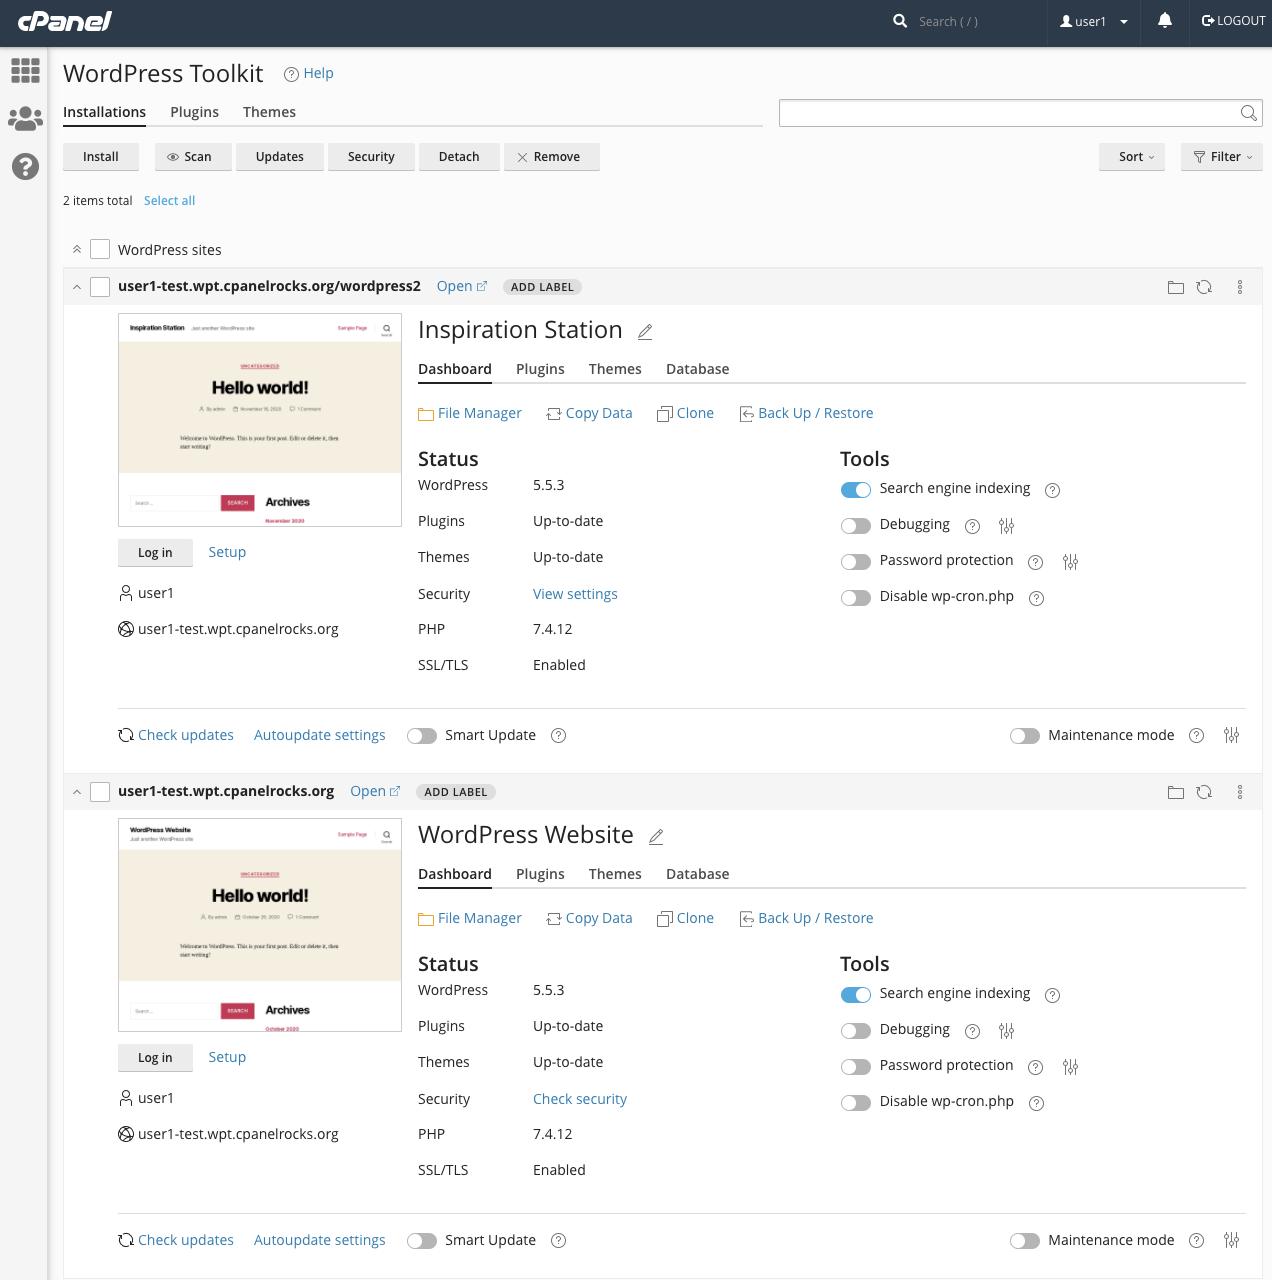 WordPress Toolkit Overview